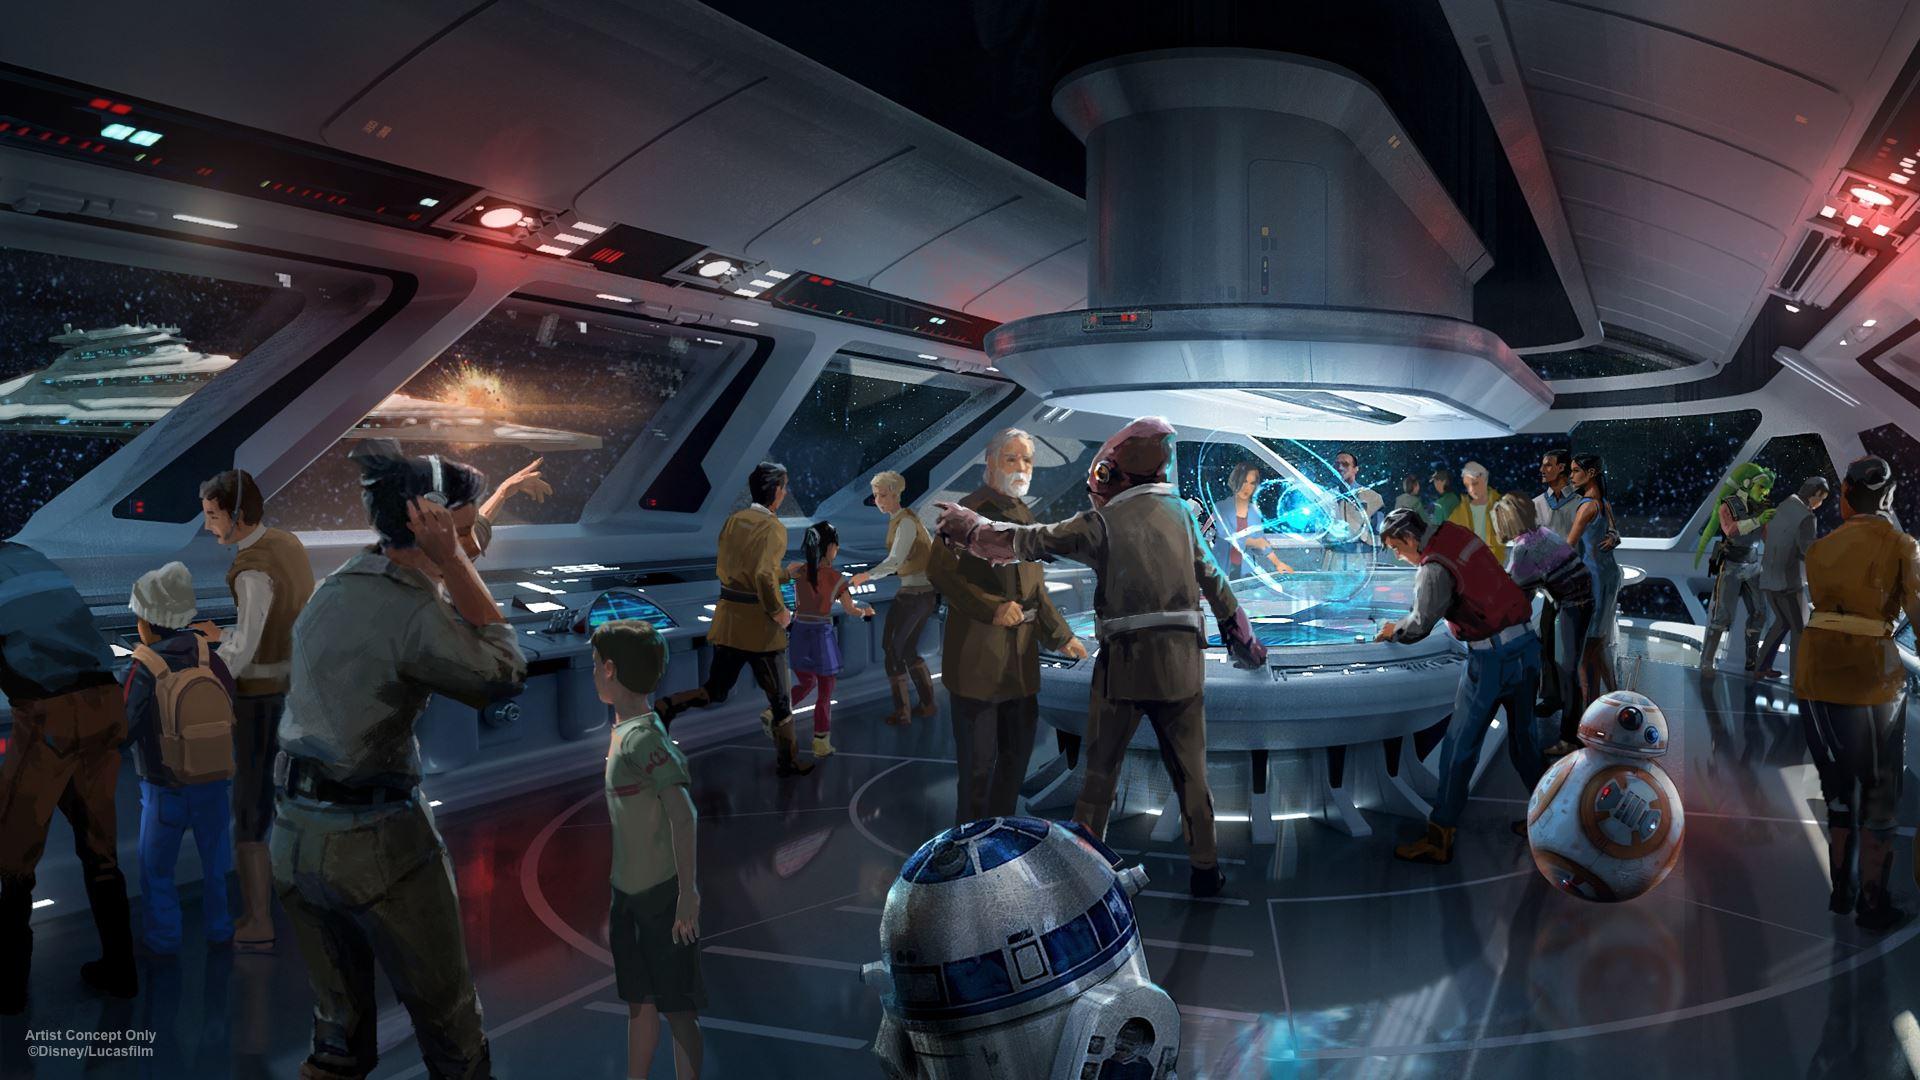 Disney's Star Wars-themed resort hotel